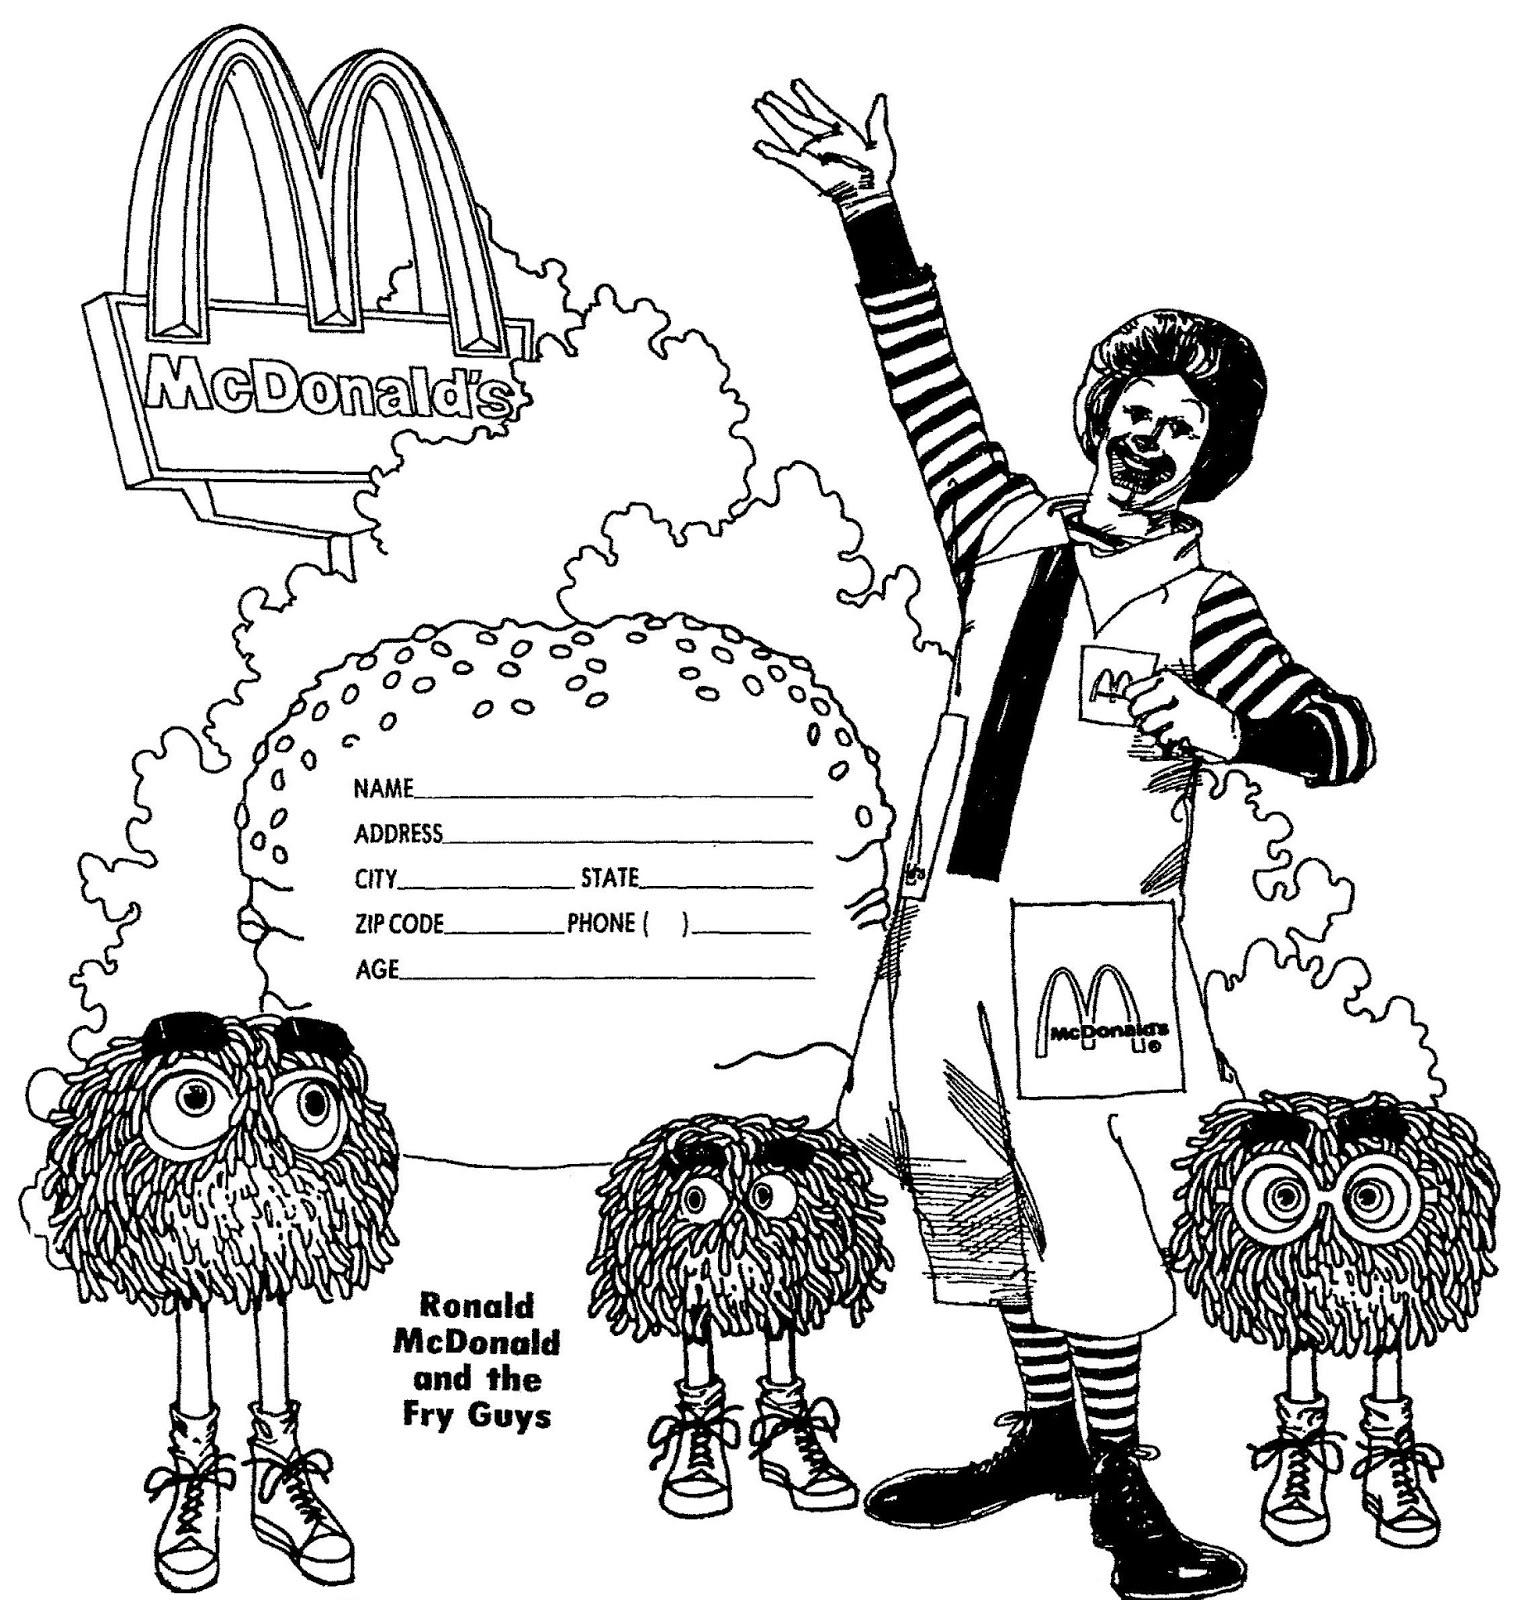 Image Ronald McDonald coloring paperjpg McDonalds Wiki